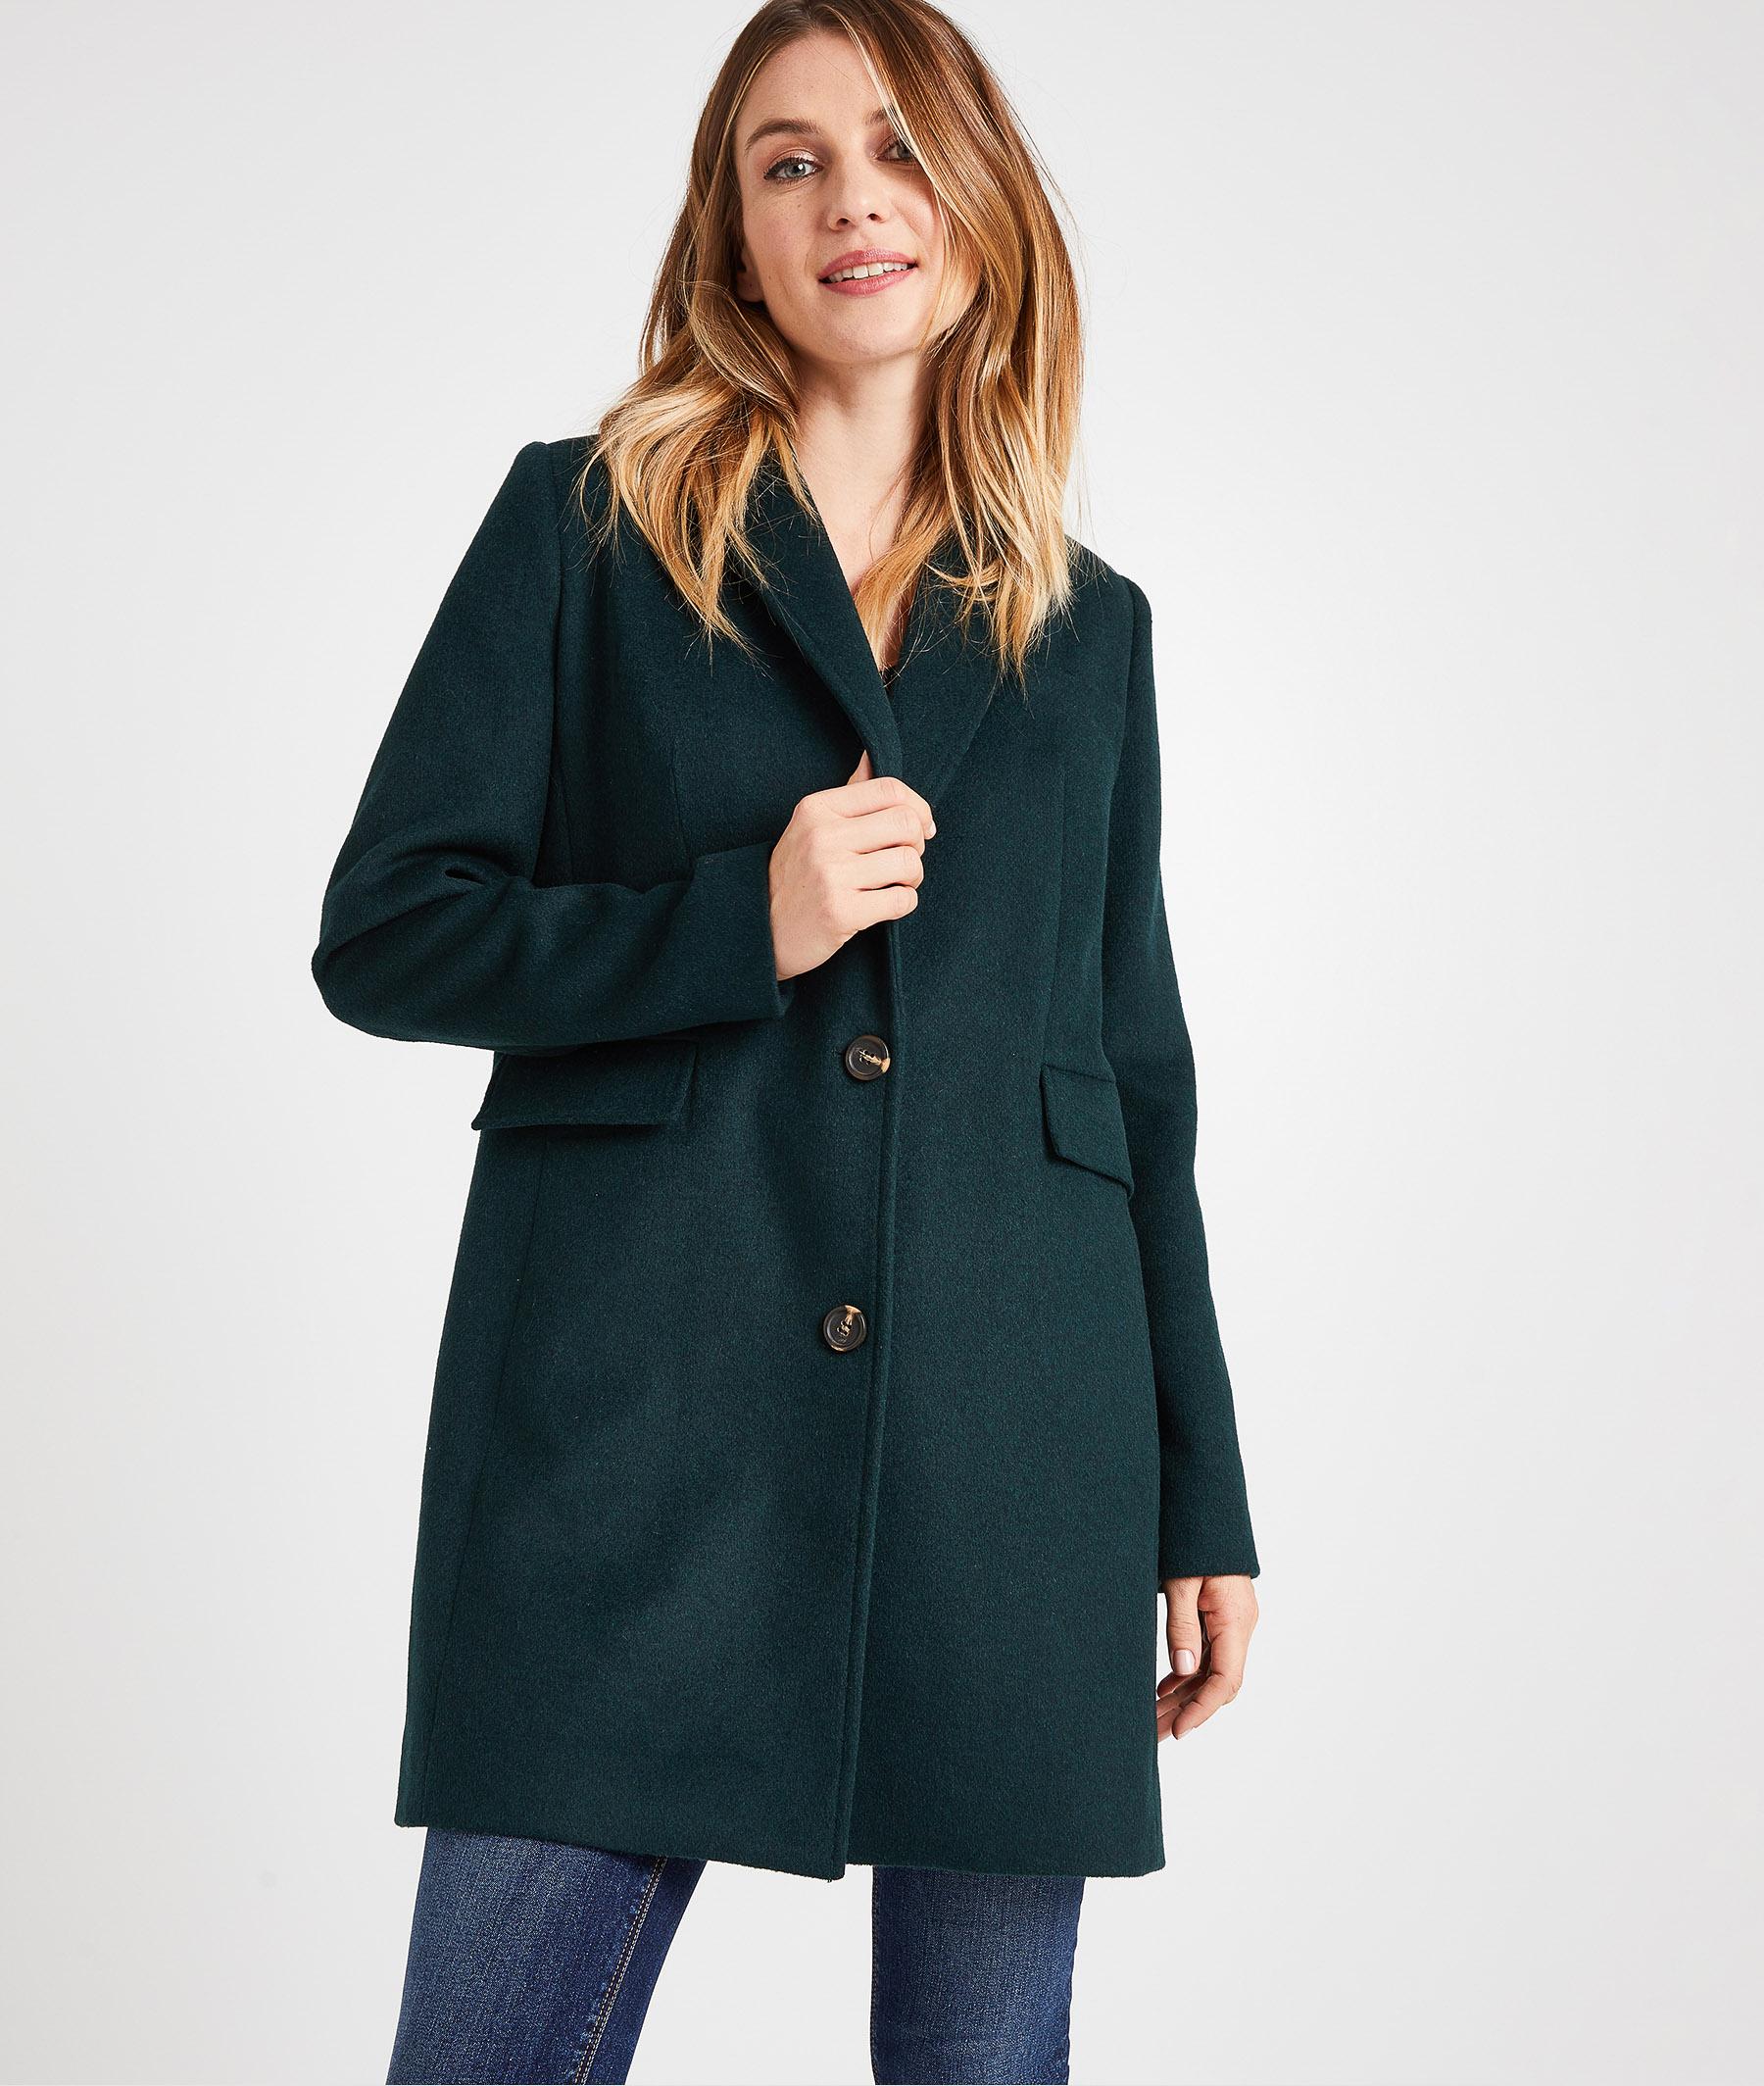 Manteau pardessus vert femme VERT